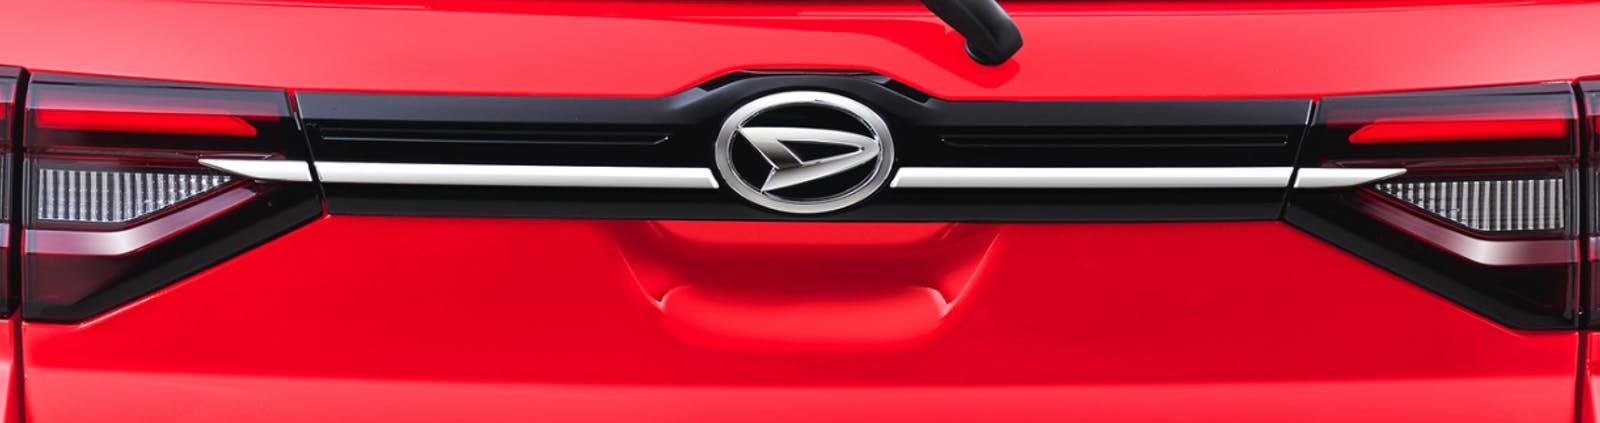 Harga dan Spesifikasi Daihatsu Rocky Pekanbaru - Black Backdoor Garnish with Chrome List (ADS)